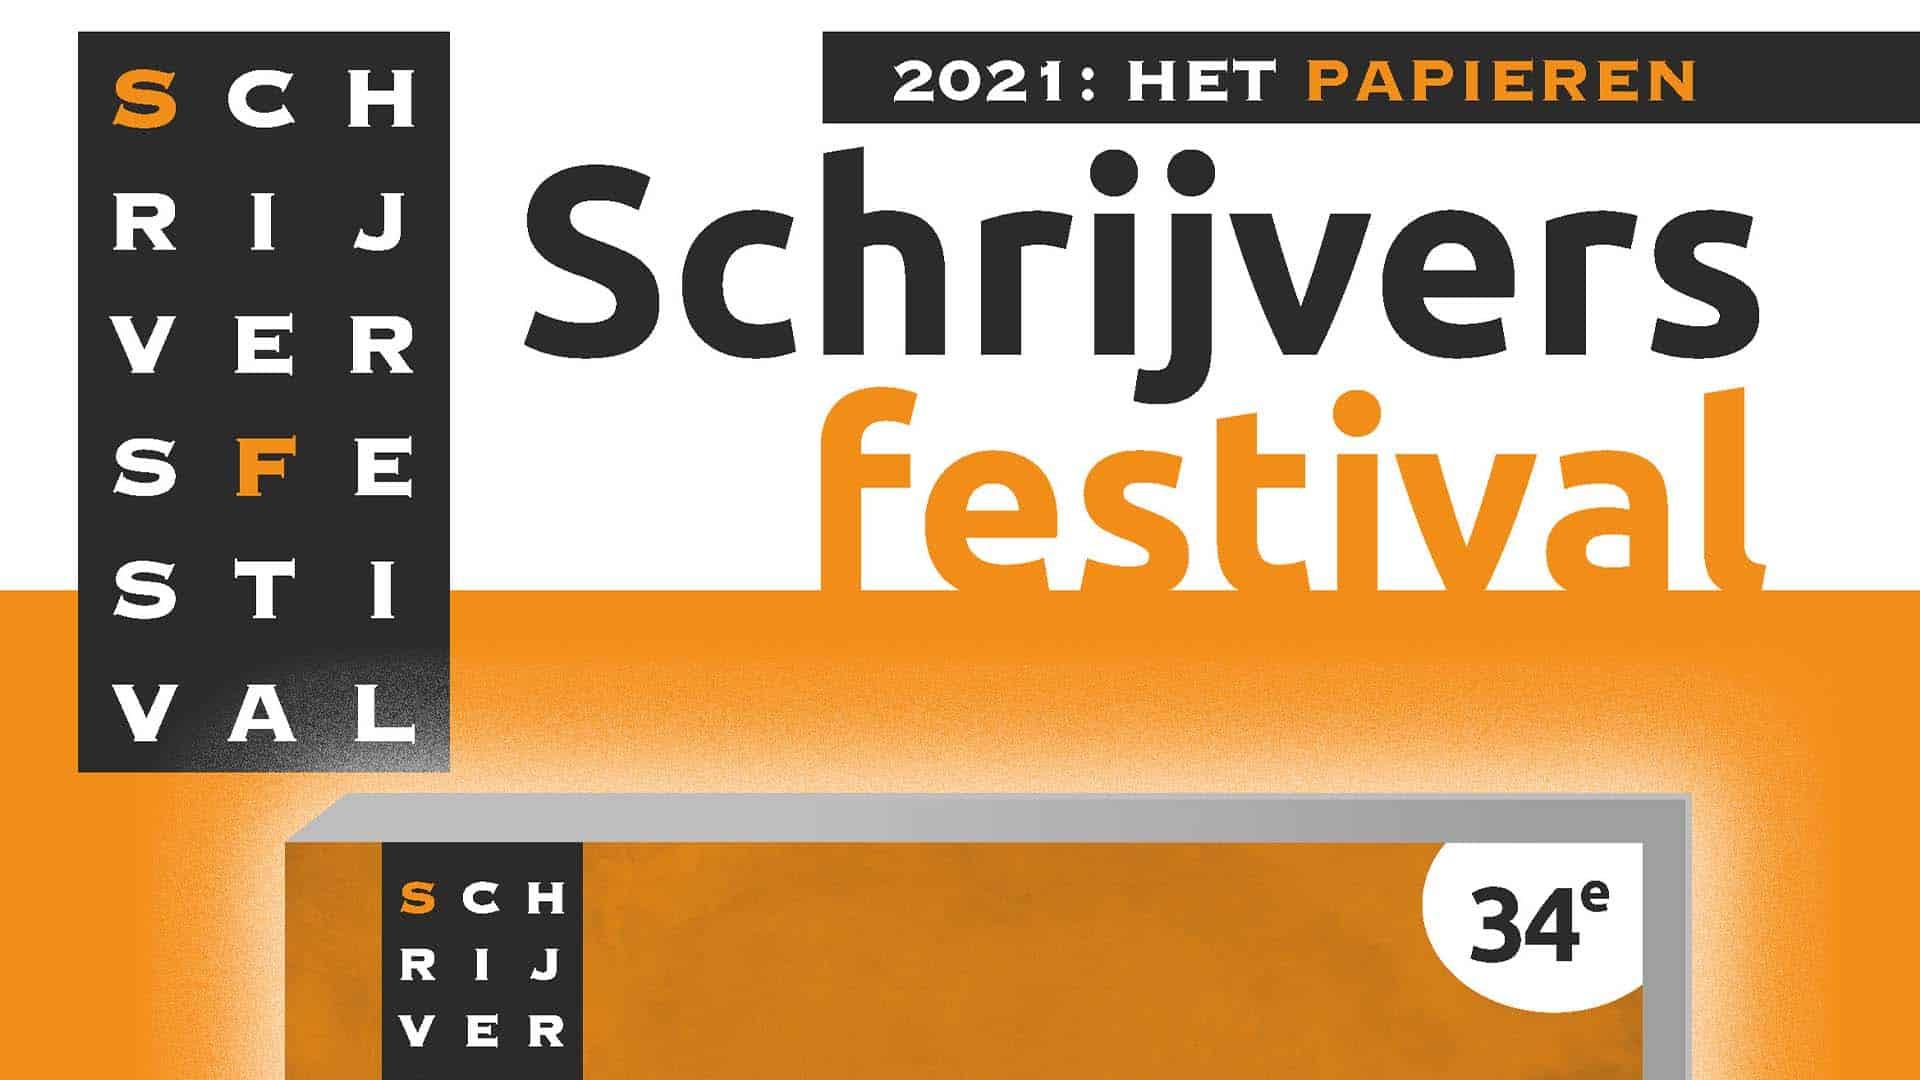 Schrijversfestival 2021